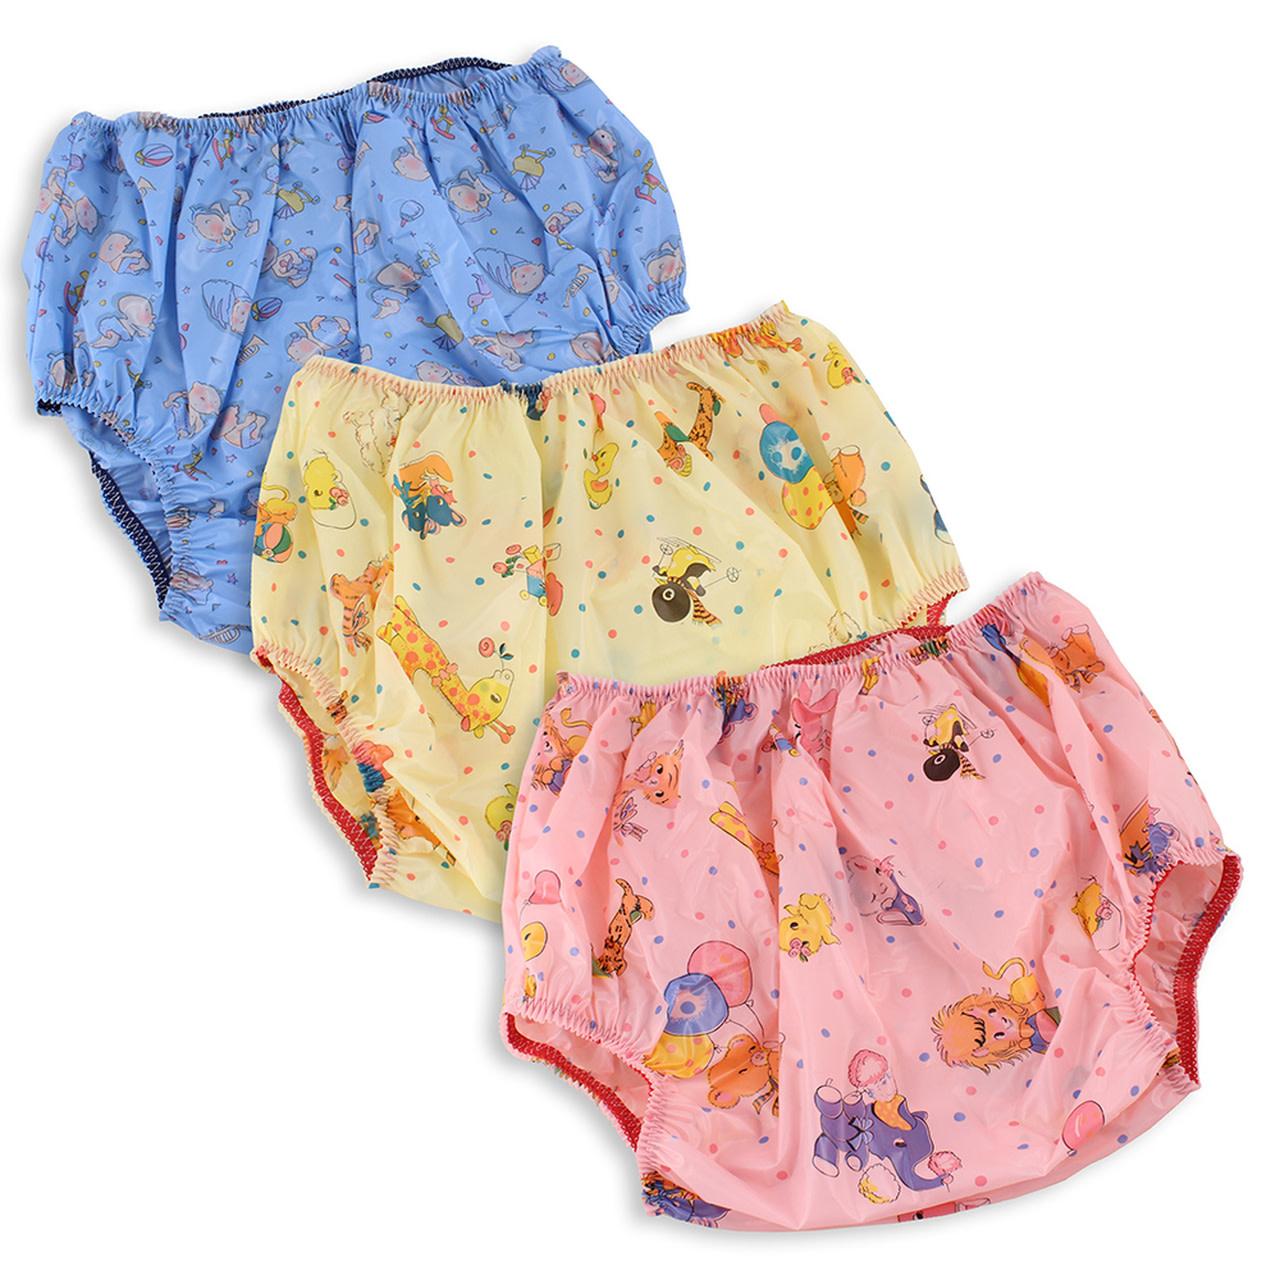 Christy Plastic Pants